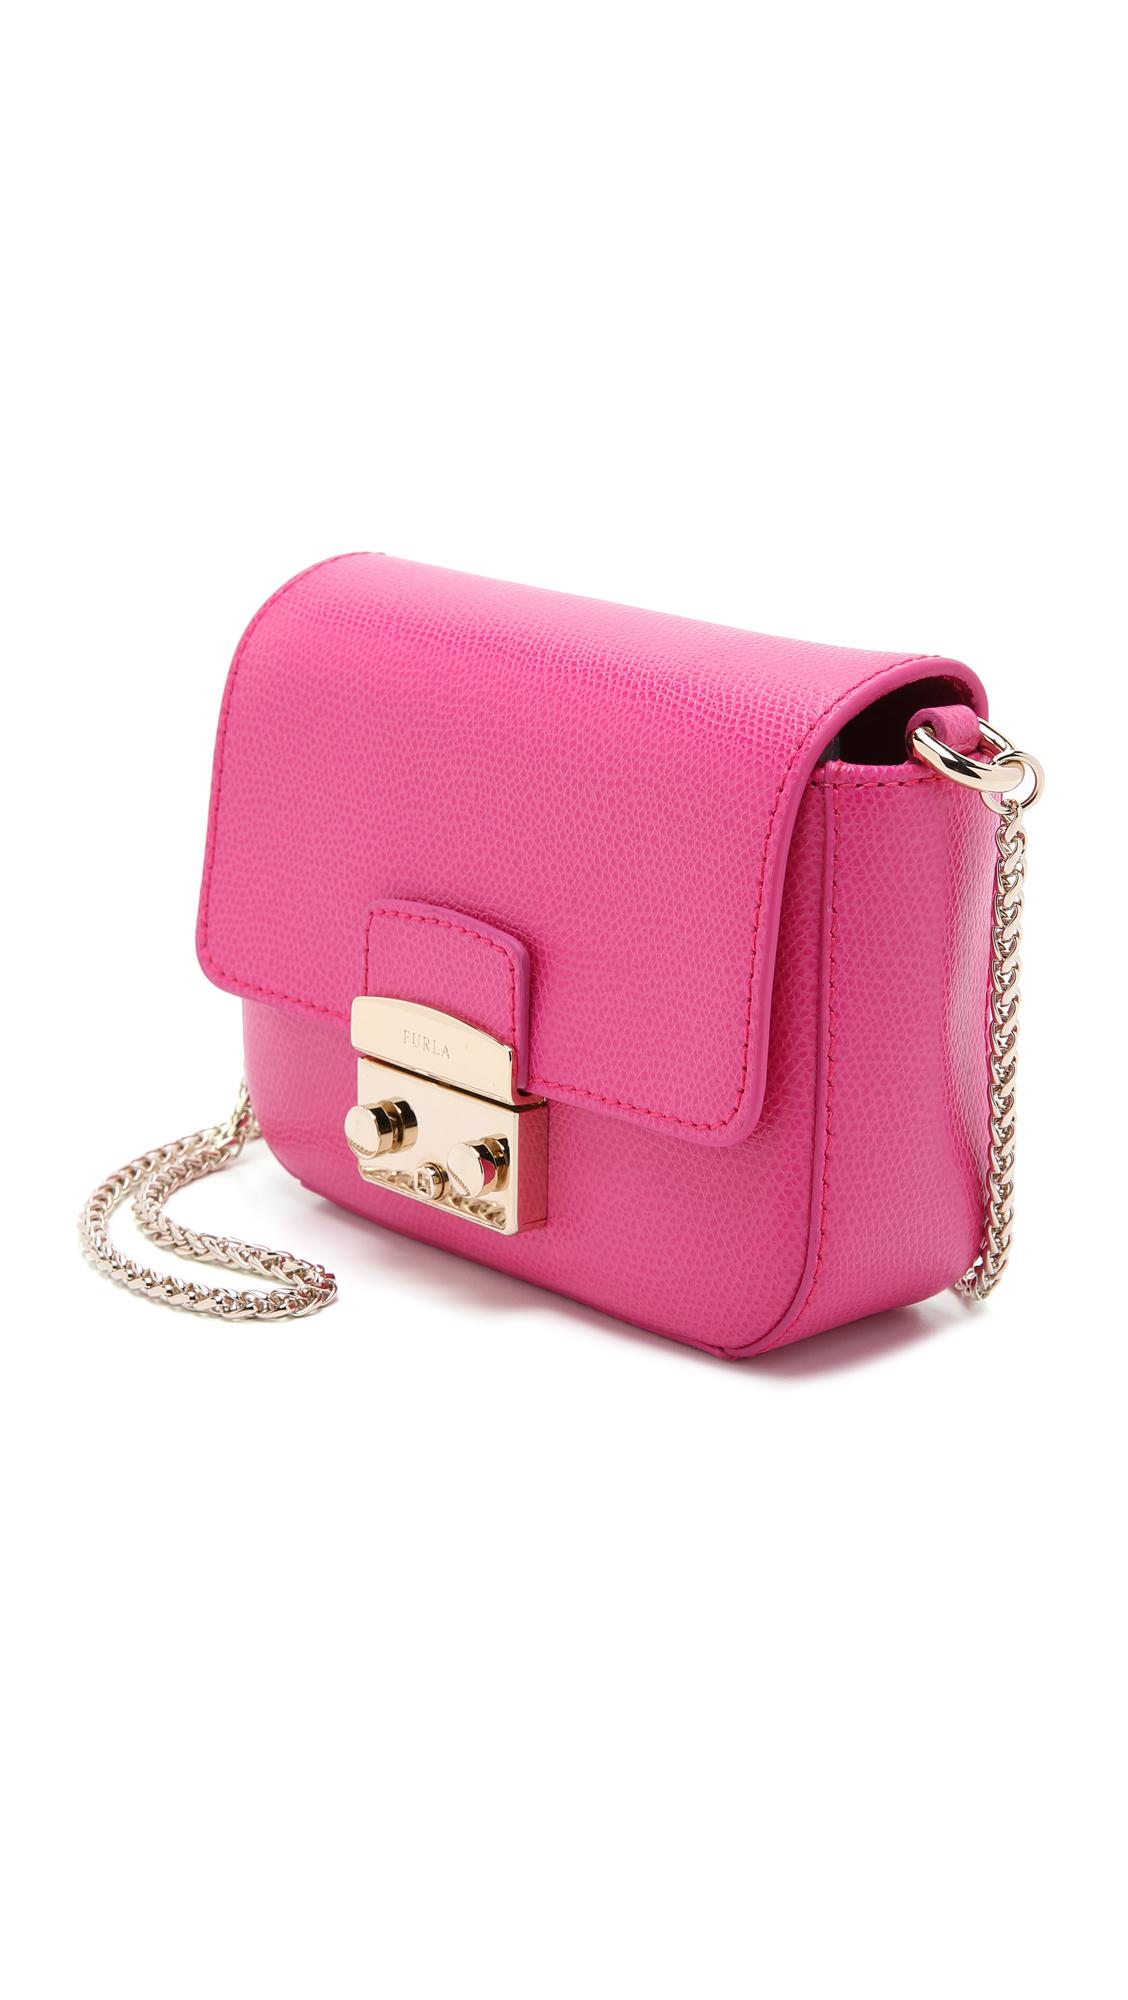 Furla Metropolis Mini pink bag body LUODAyoH8